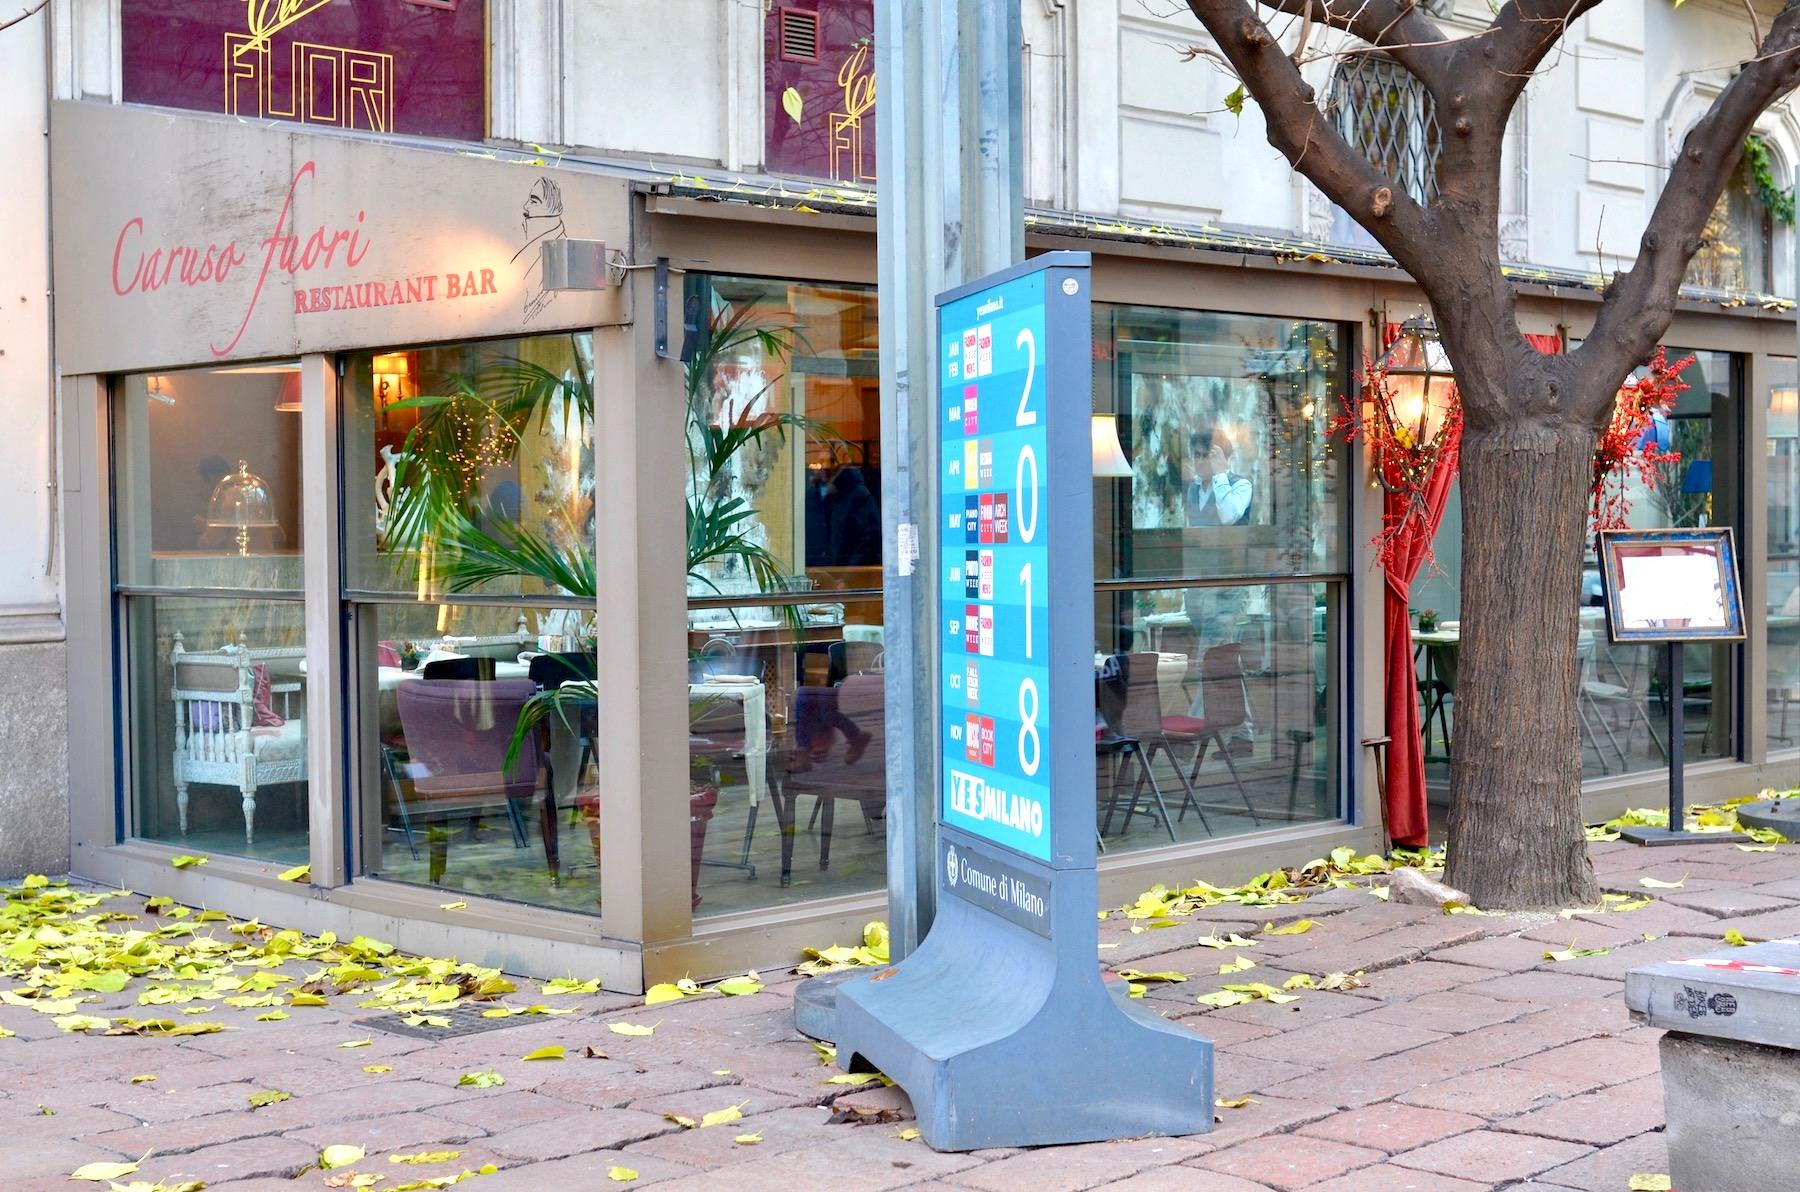 caruso-beta-pinheiro-restaurante